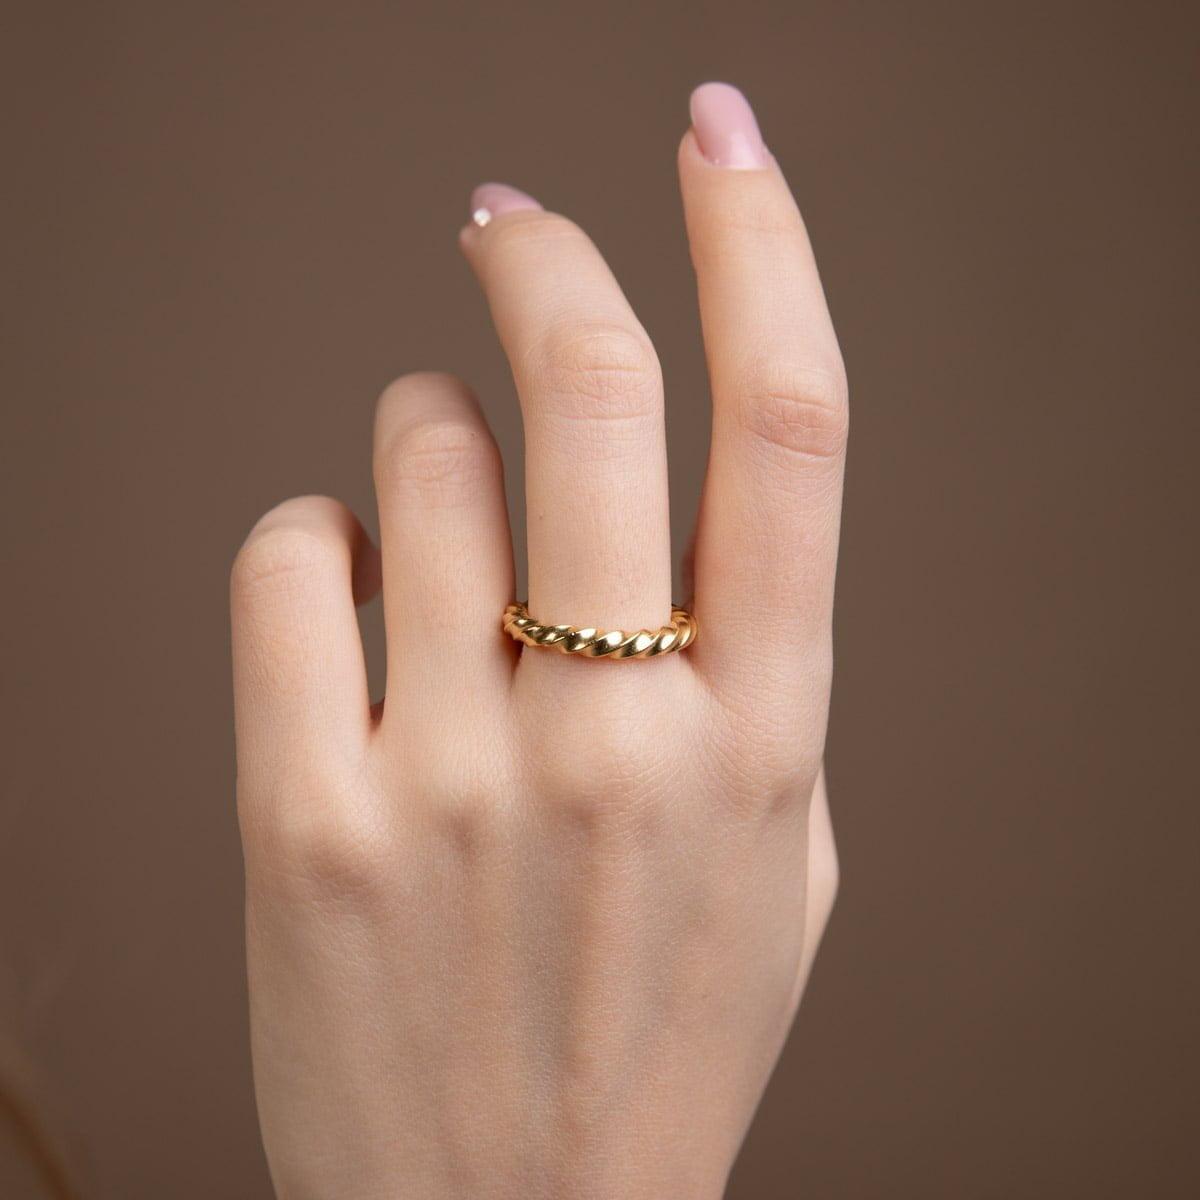 Inel din argint Manissi Reverse Twist placat cu aur 18k